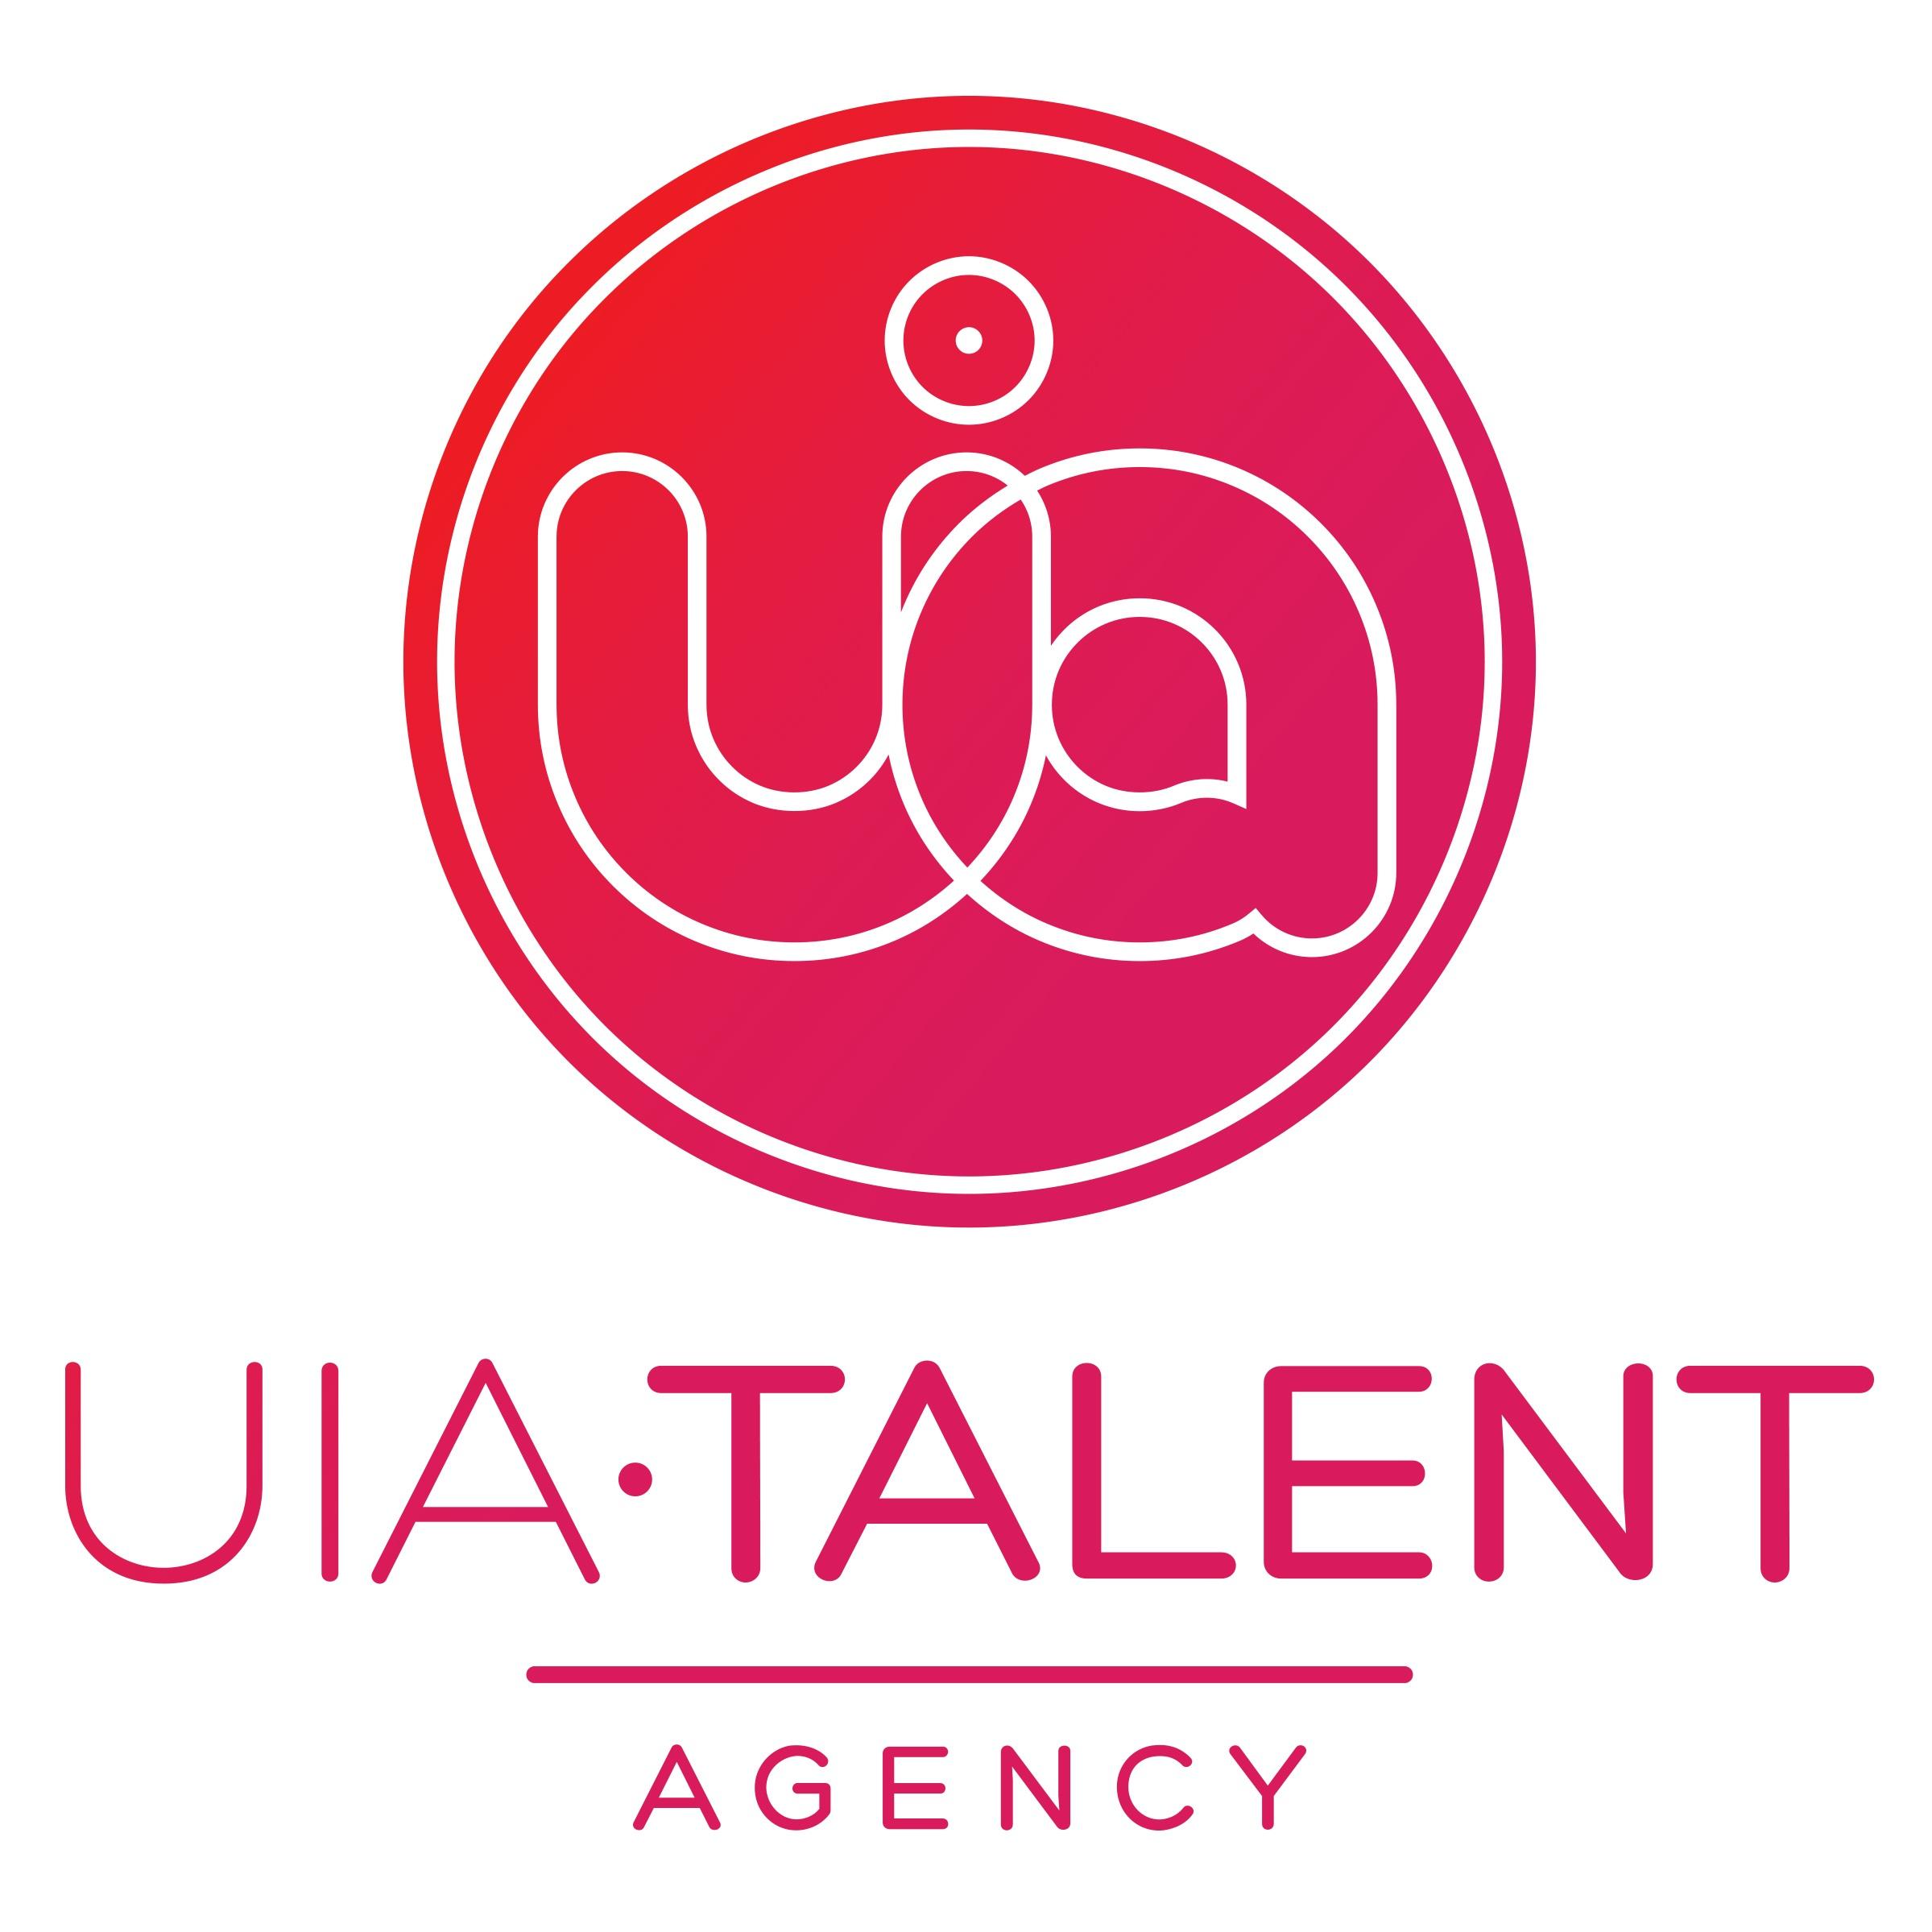 UIA Talent Agency - 850 7th Ave   Suite 1003   New York, NY   10019(212) 969-1797Vanessa Uzan [vanessa@uiatalent.com]